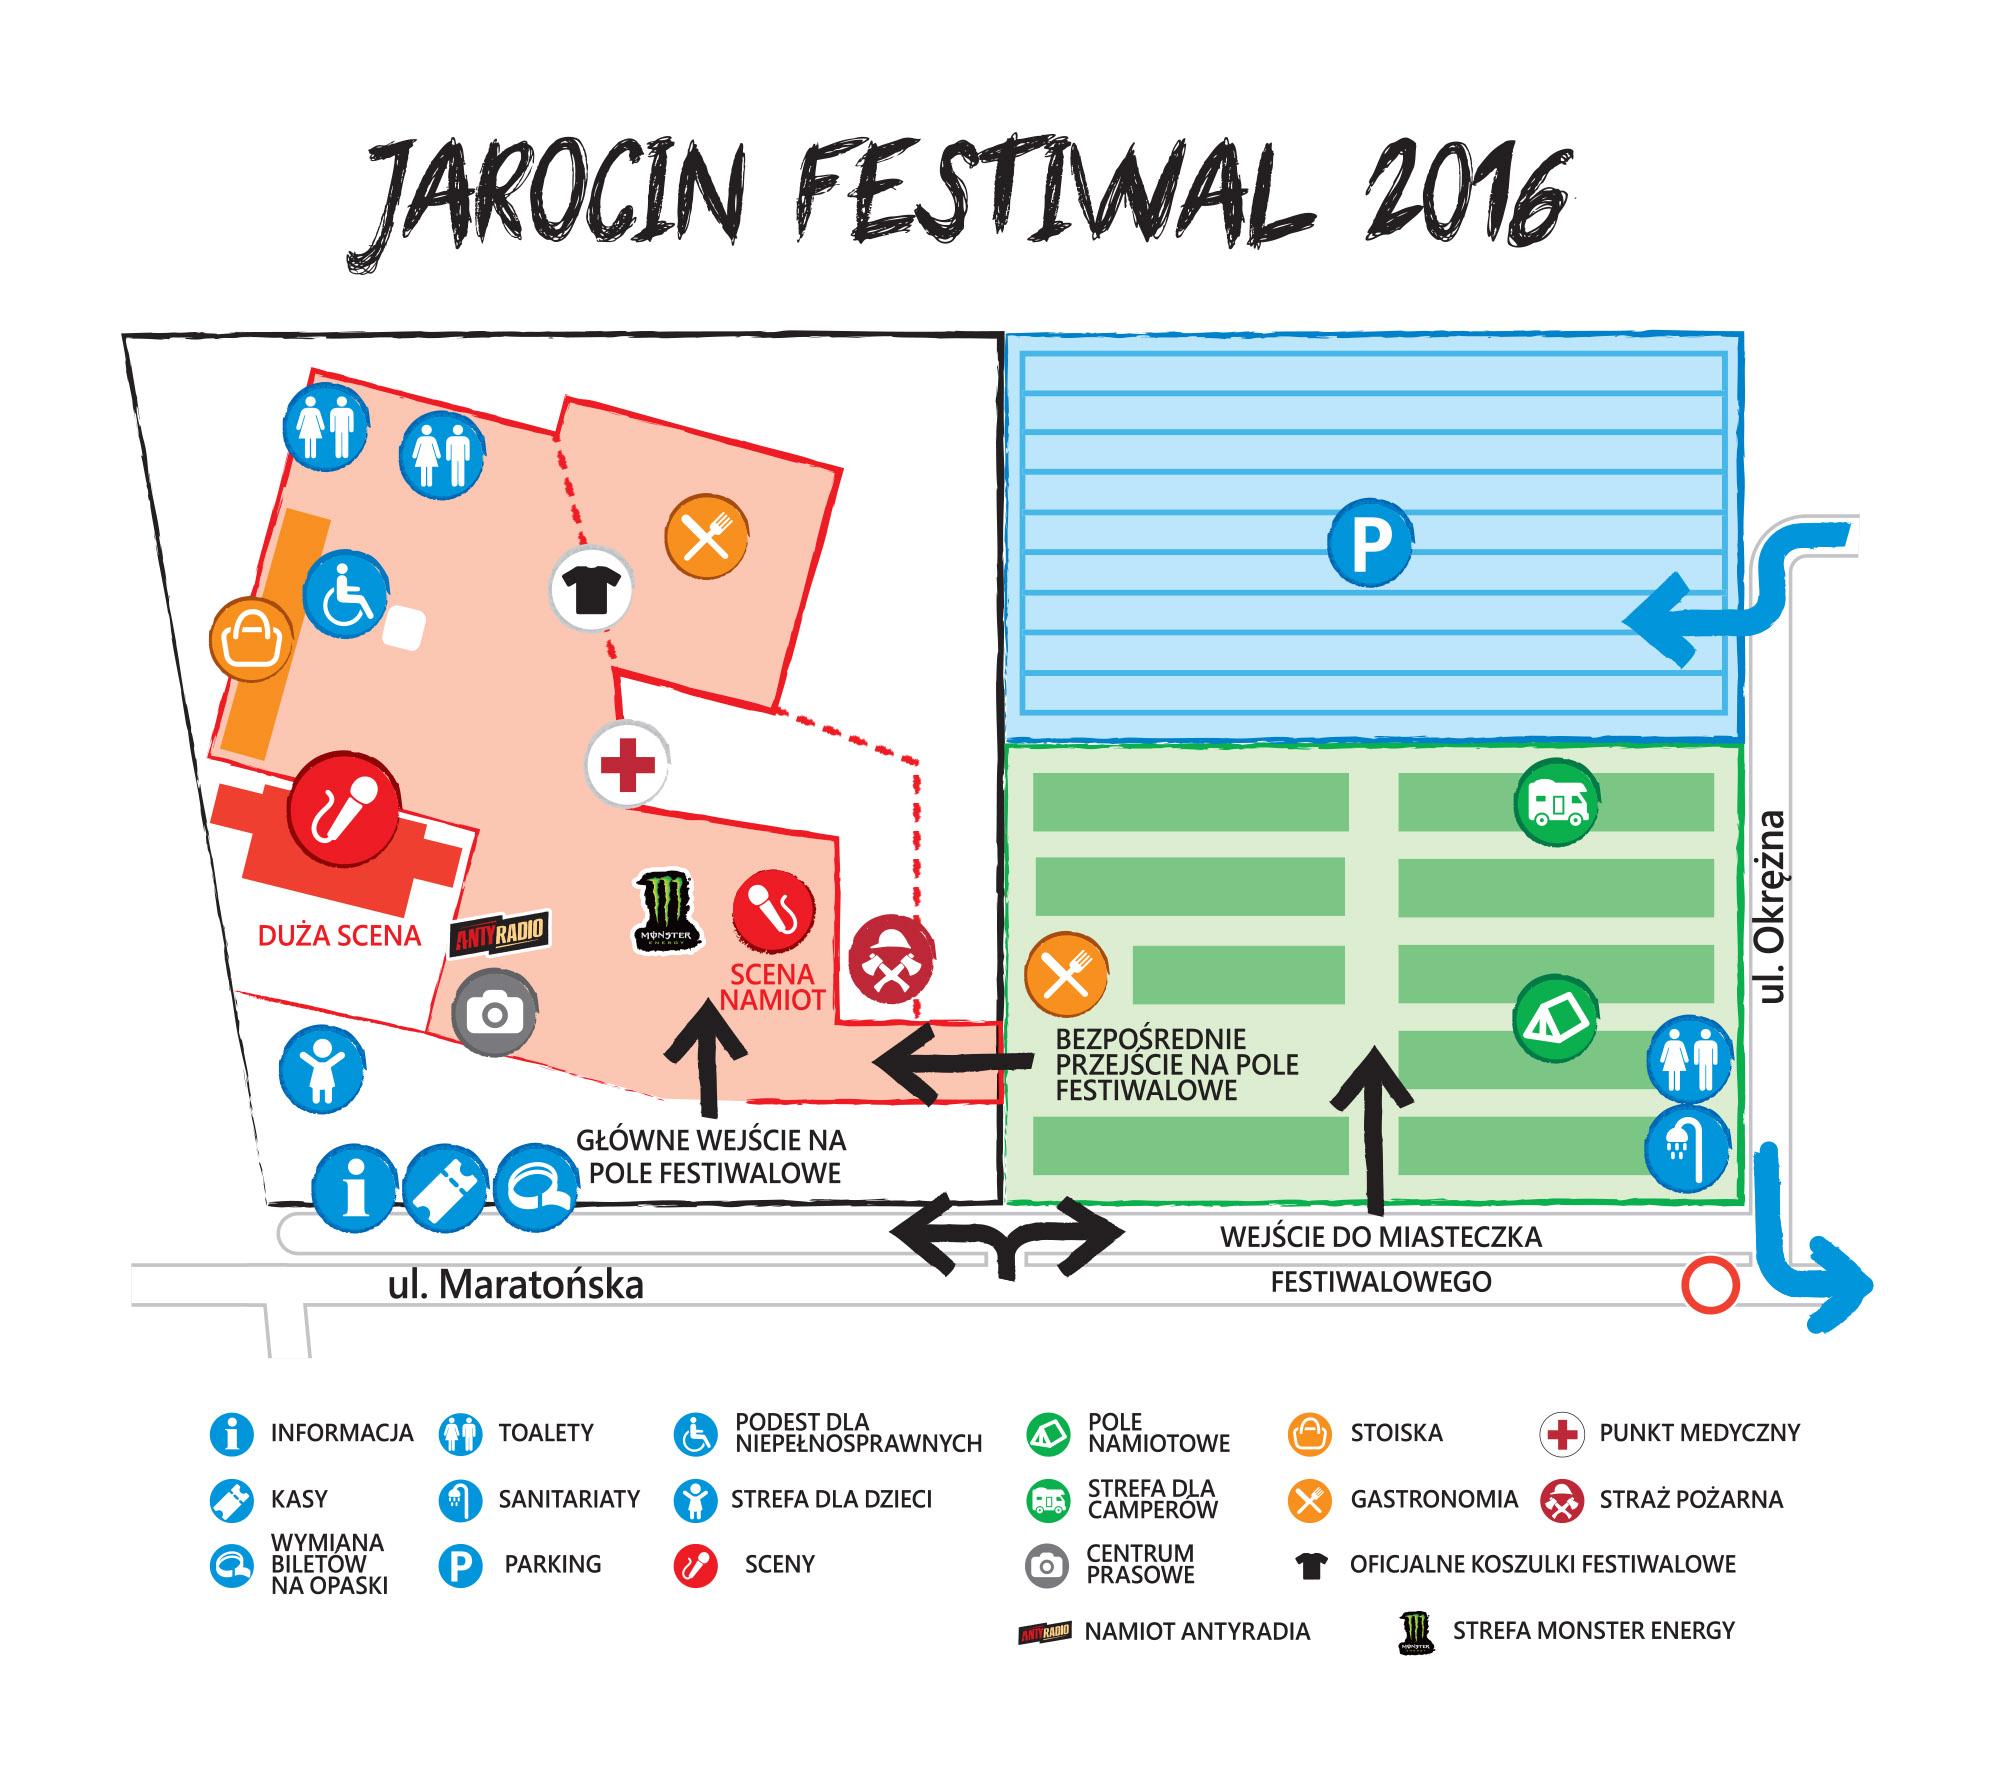 mapa JAROCIN FESTIWAL 2016